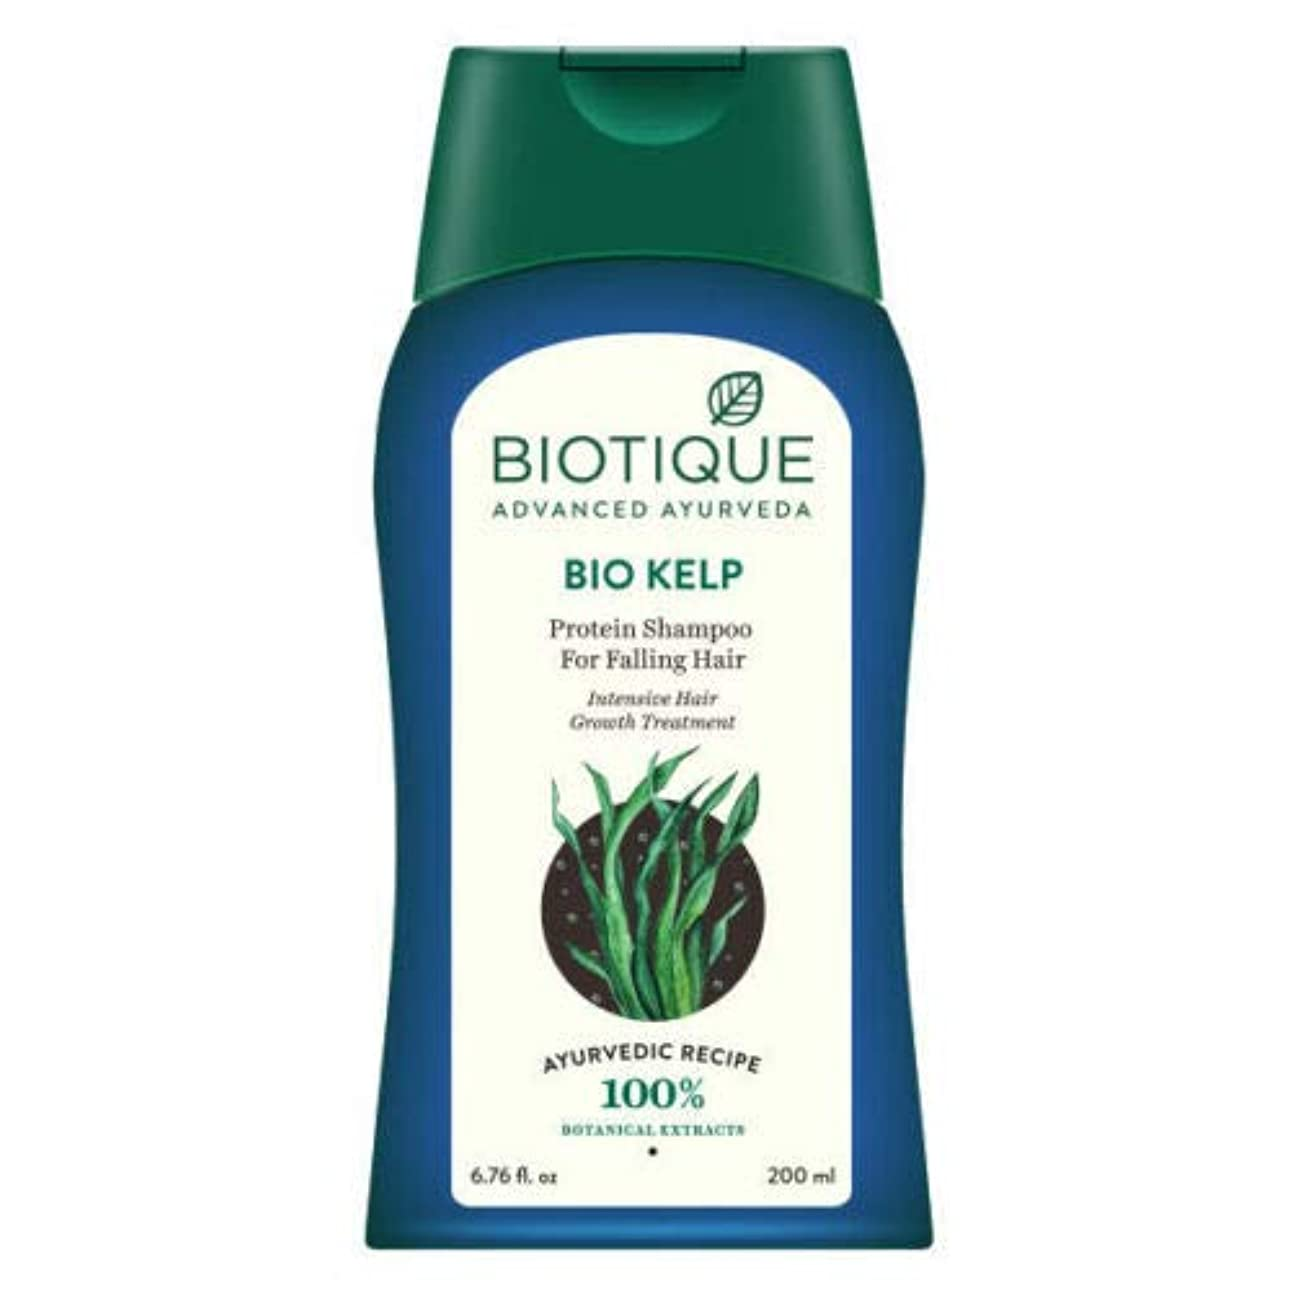 Biotique Bio Kelp Protein Shampoo For Falling Hair (200 ml) 100% Natural Recipe 落下の毛100%の自然な調理法のためのBiotiqueのバイオケルプ...